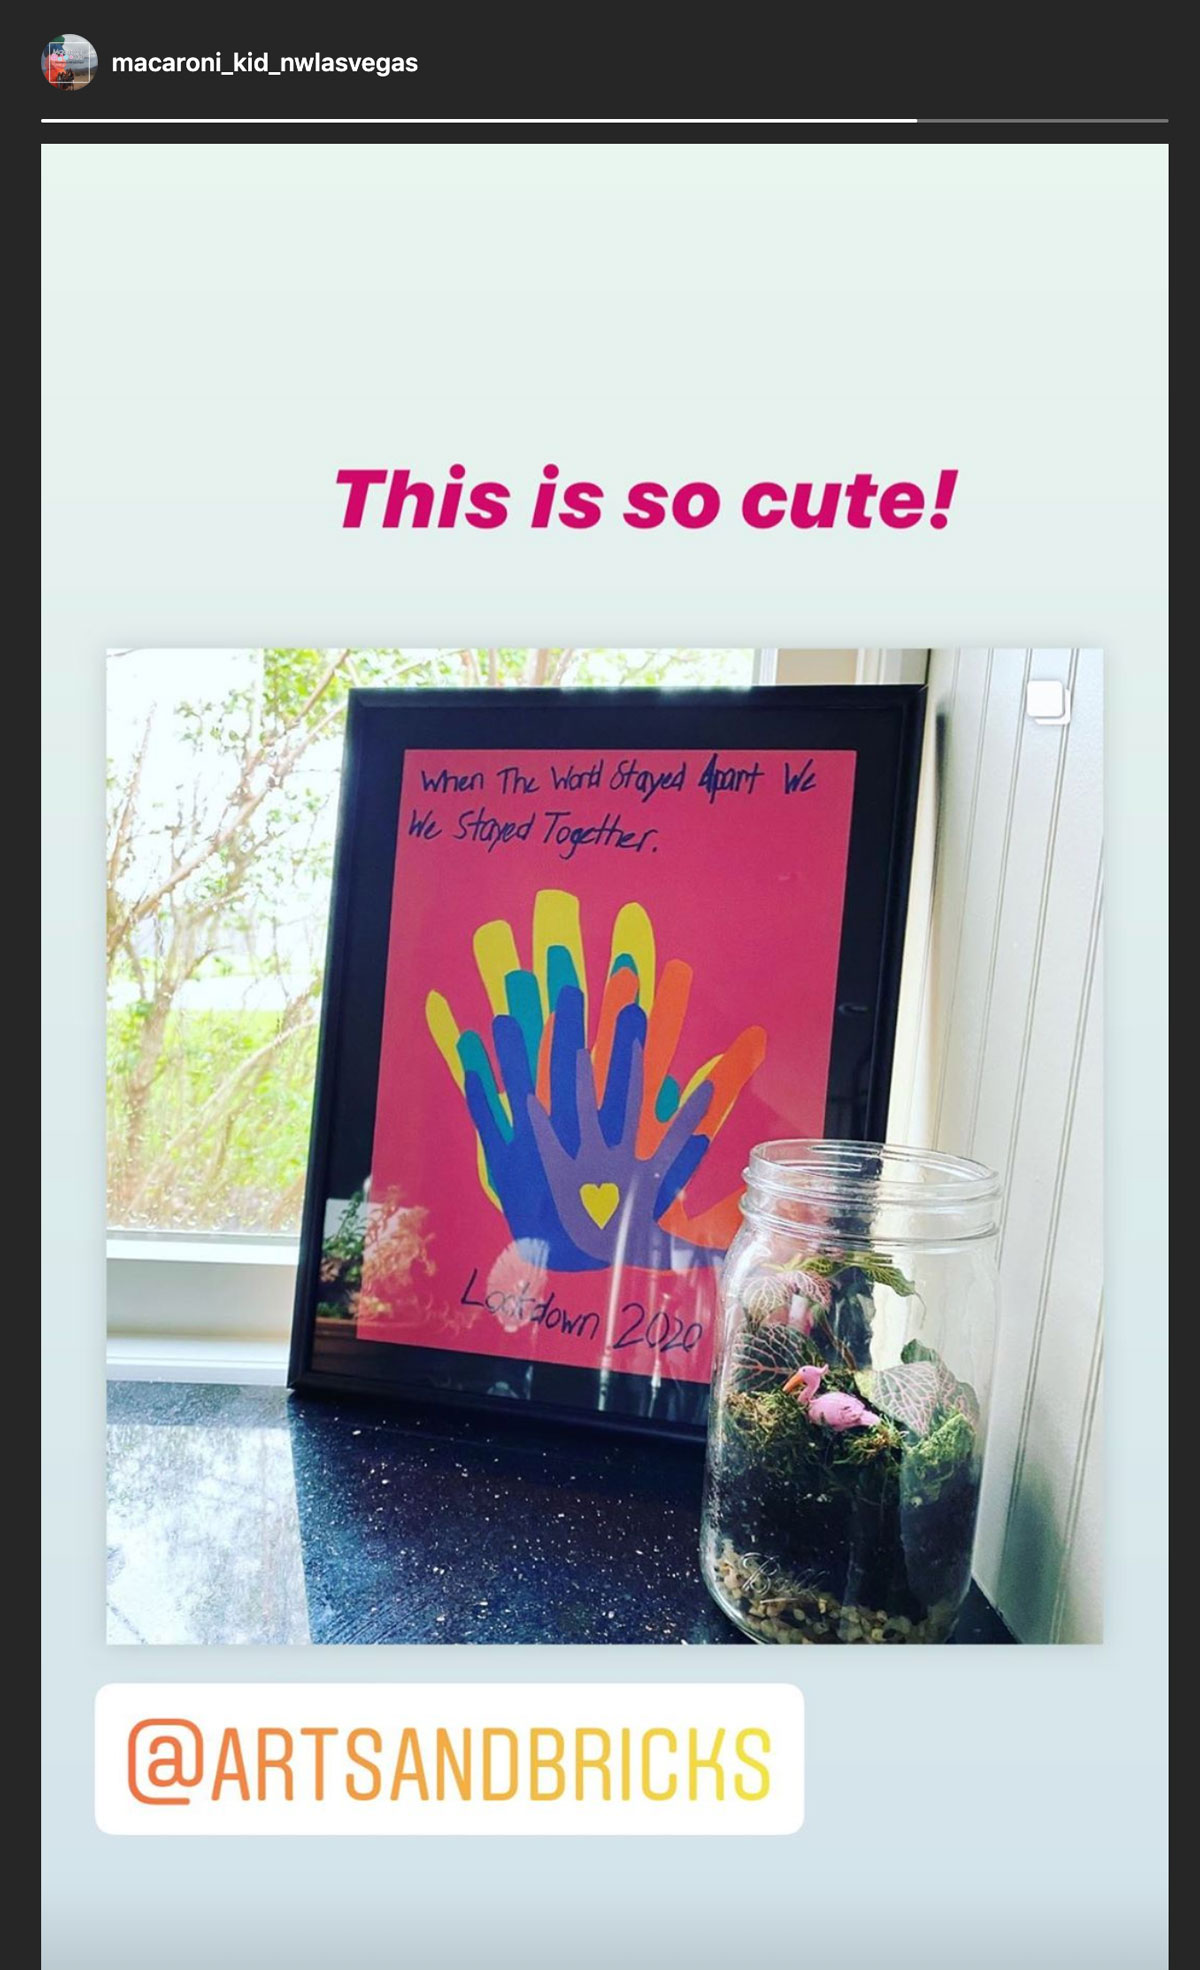 This is so cute! @artsandbricks family lockdown project